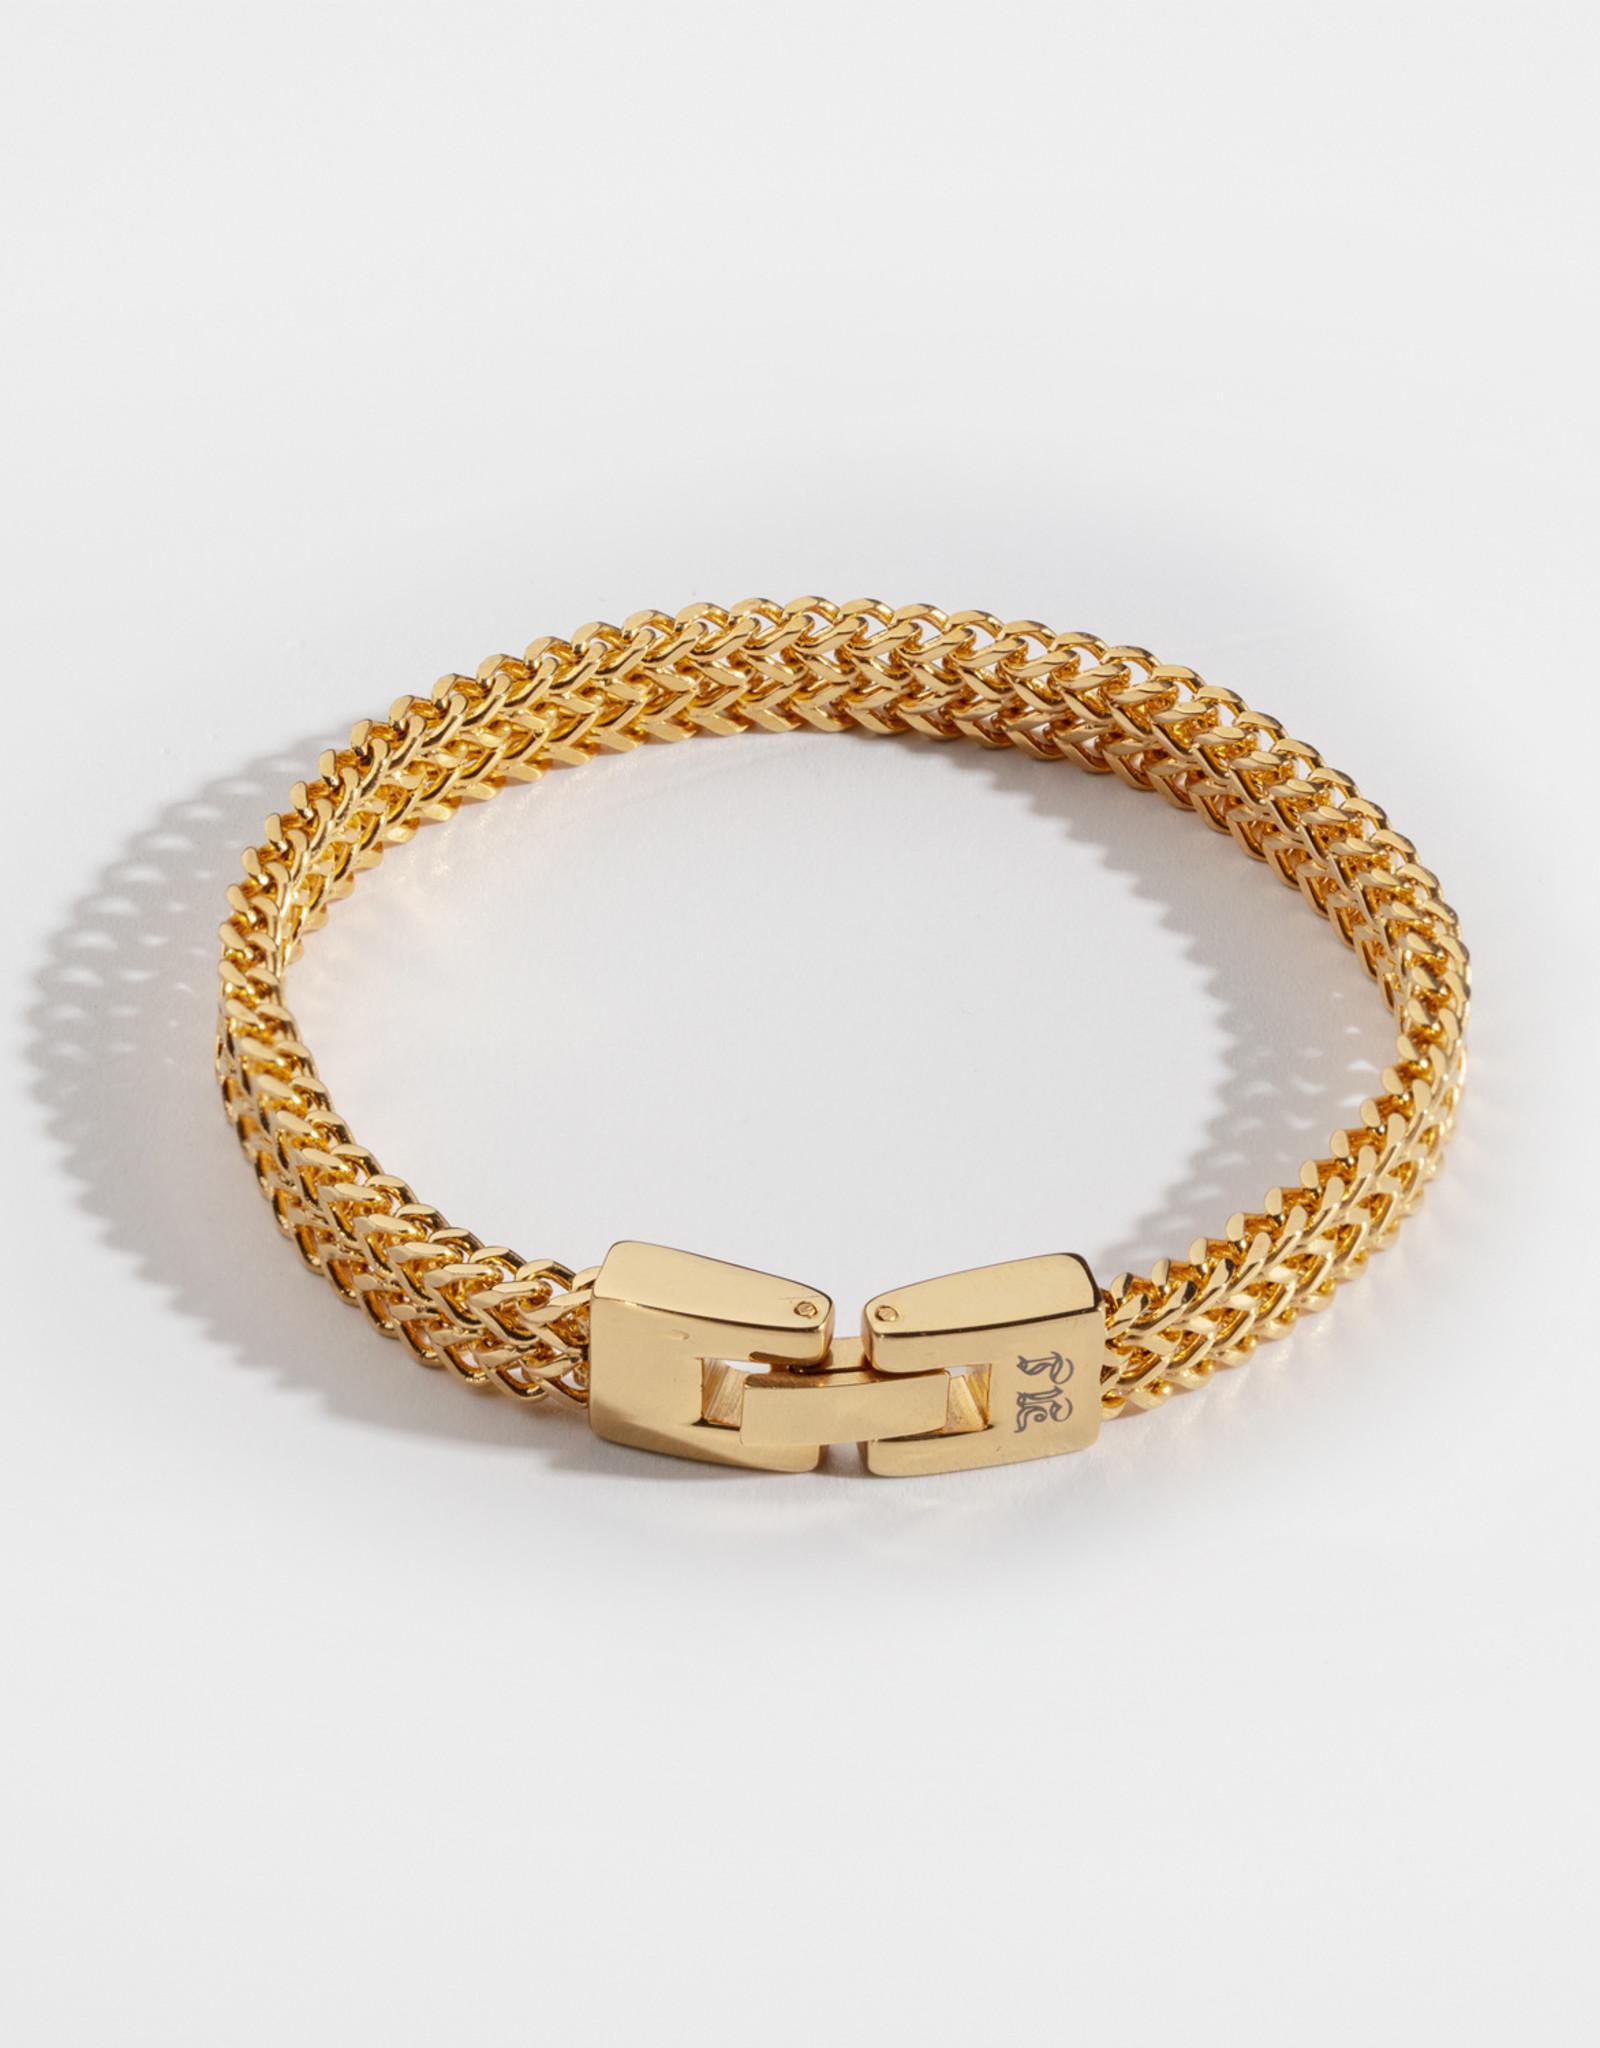 Northern Legacy NL Fehu Bracelet - Gold Tone S 19cm